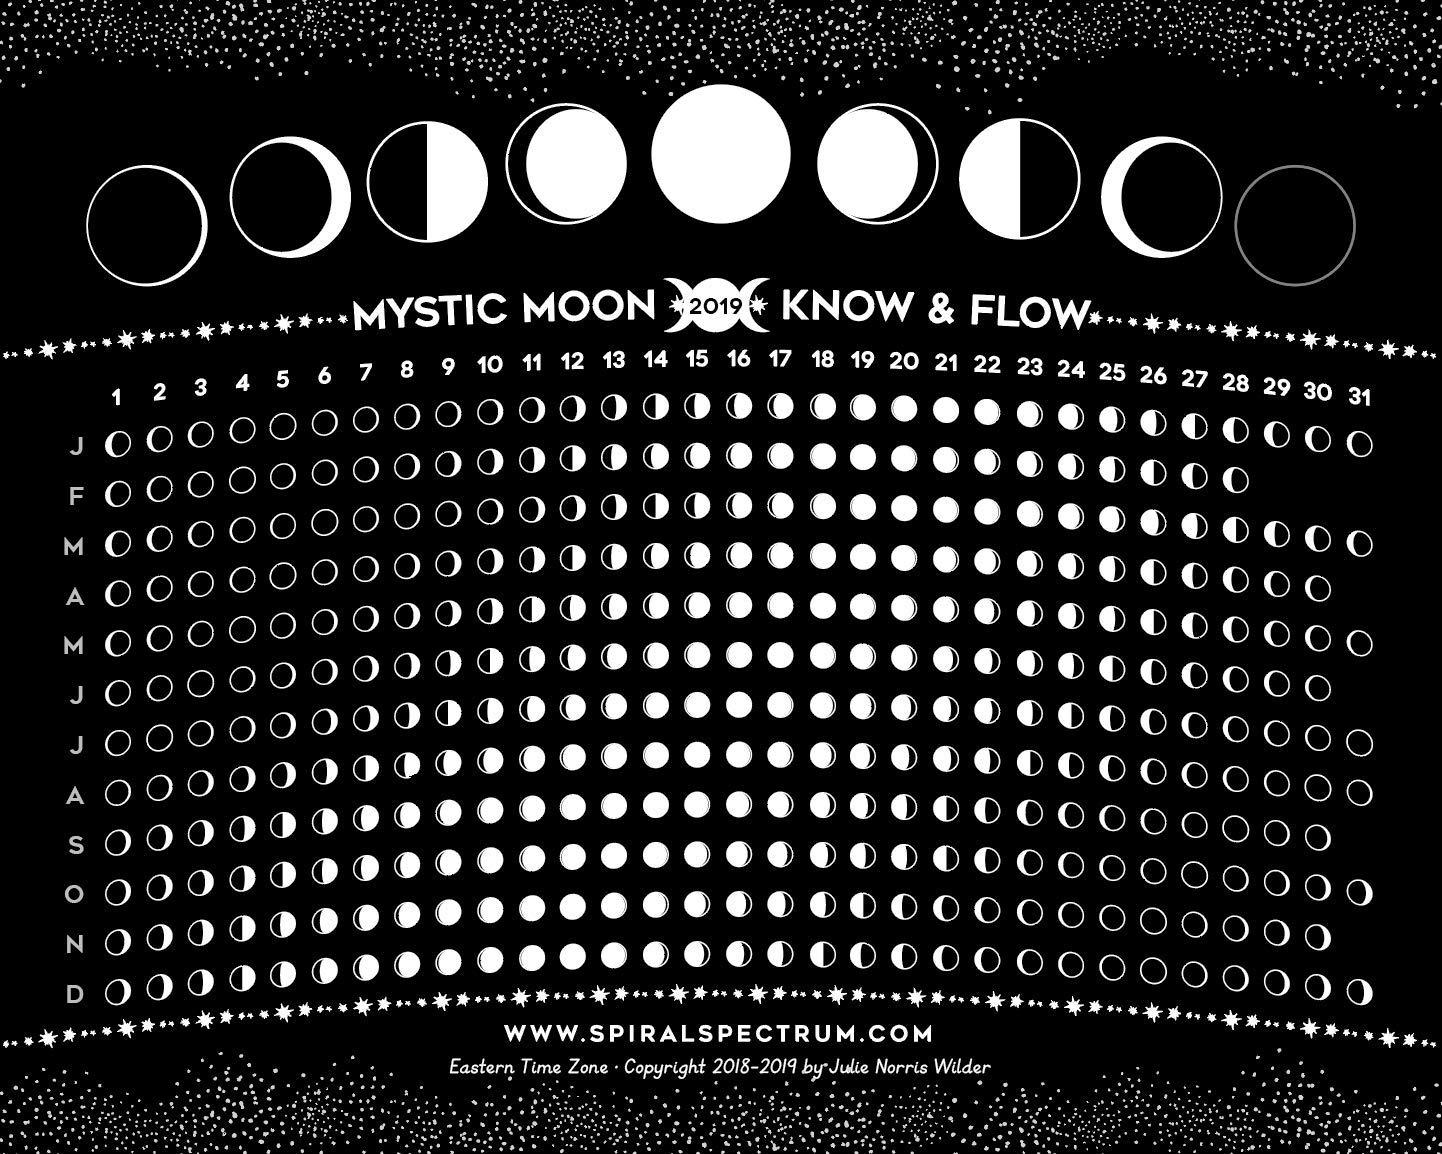 2019 Spiral Spectrum's Moon Phase Chart - 8